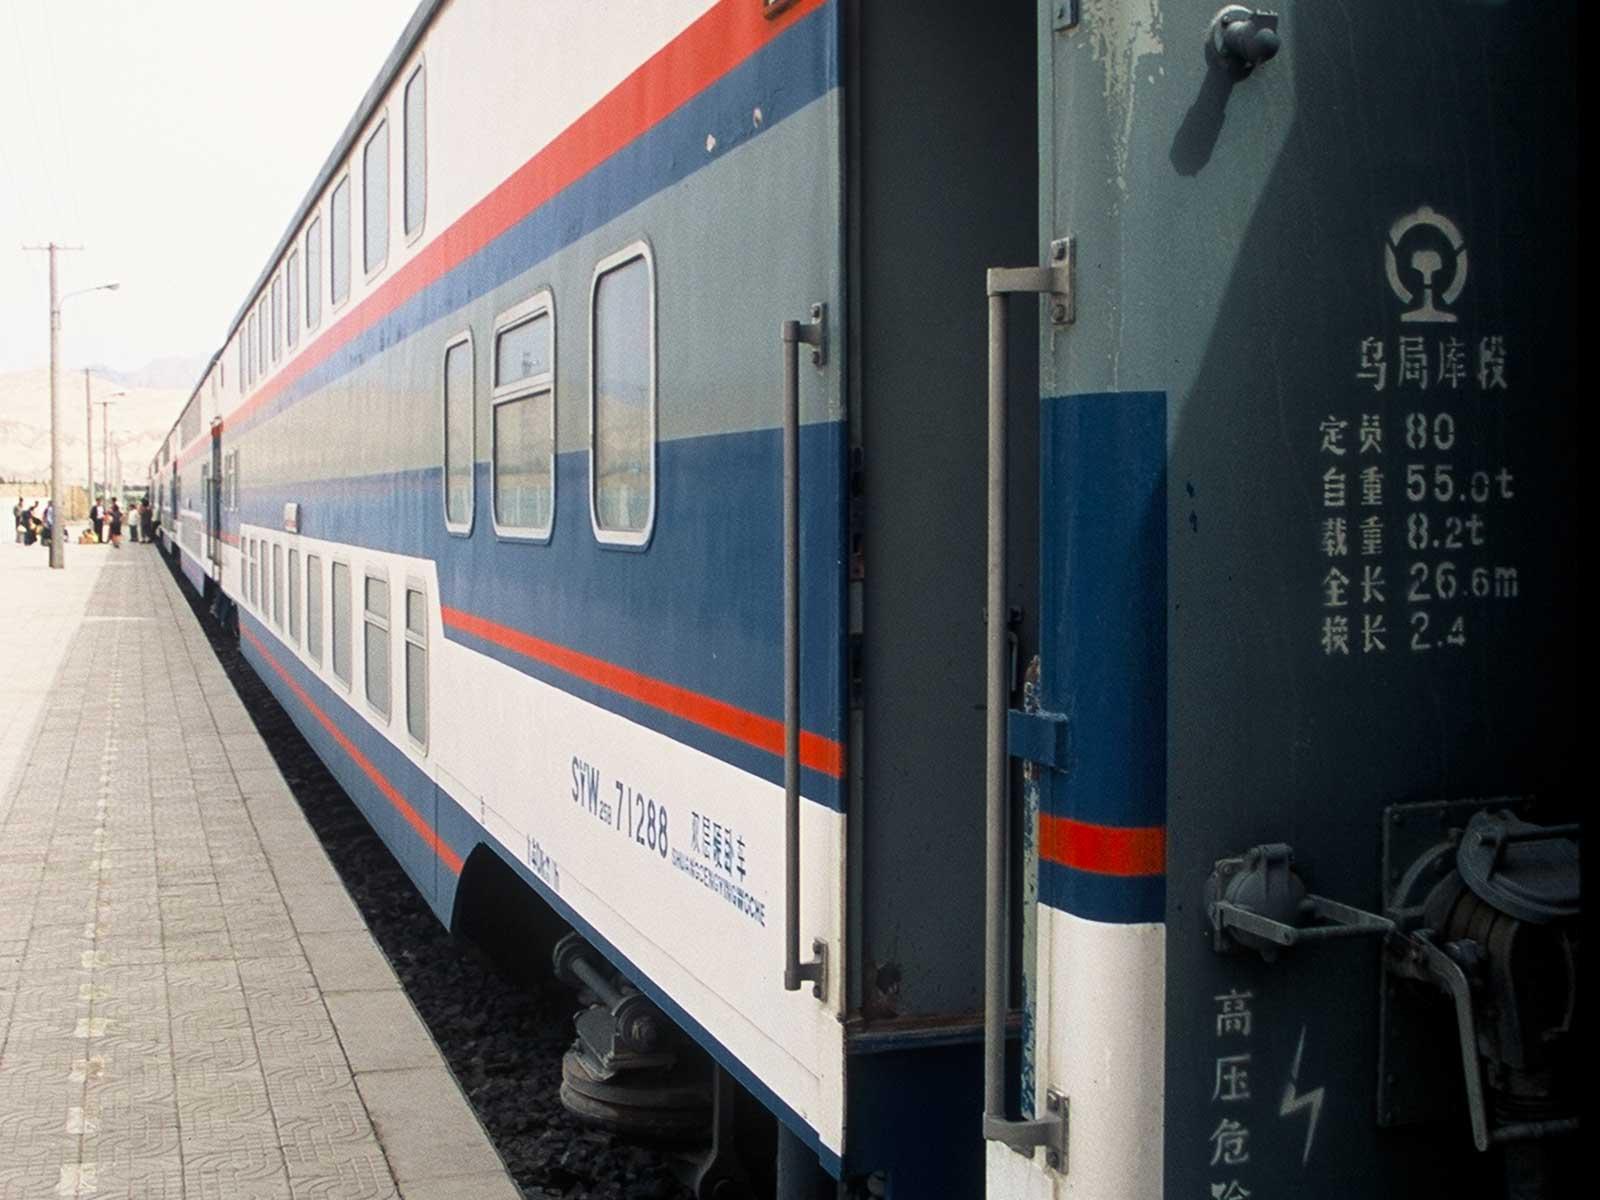 Urumqi to Kashgar train - Silk Road photo journal - Steven Andrew Martin - study abroad field research